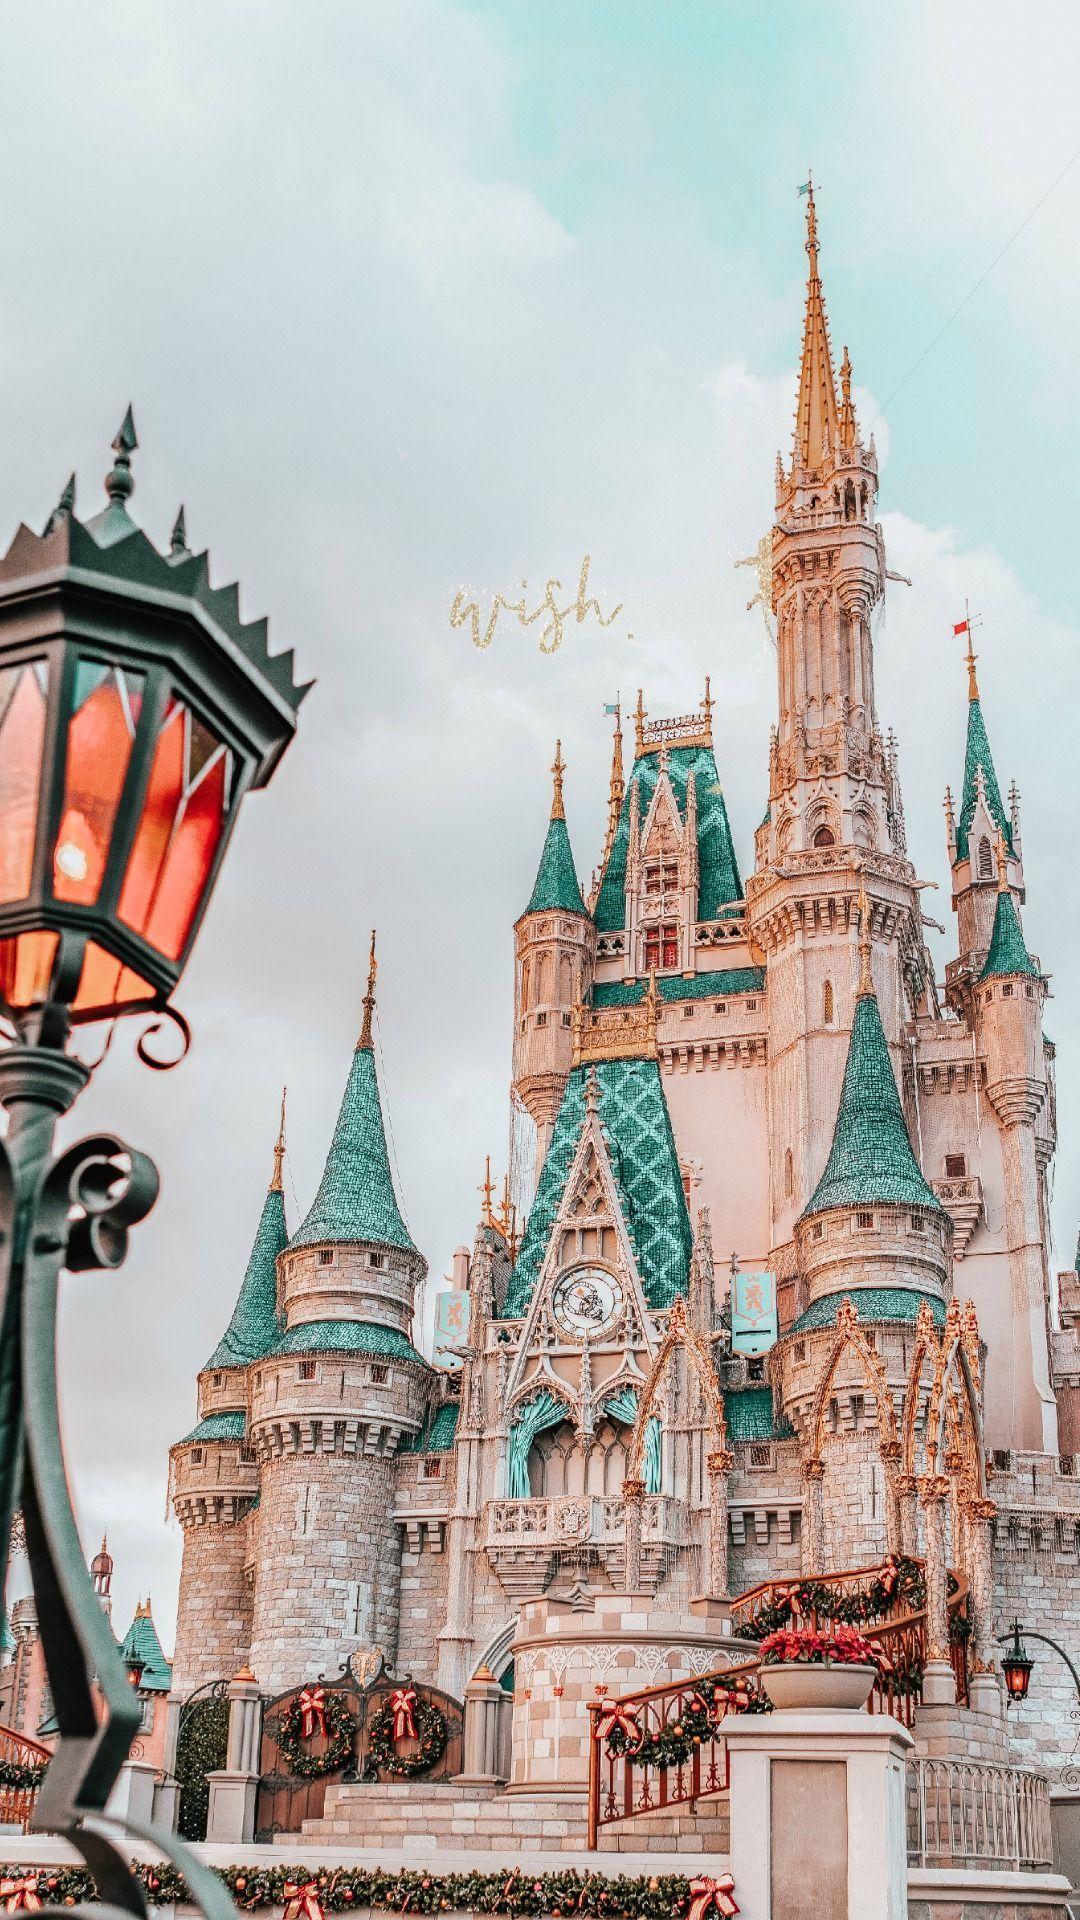 Disney World Iphone Wallpapers Top Free Disney World Iphone